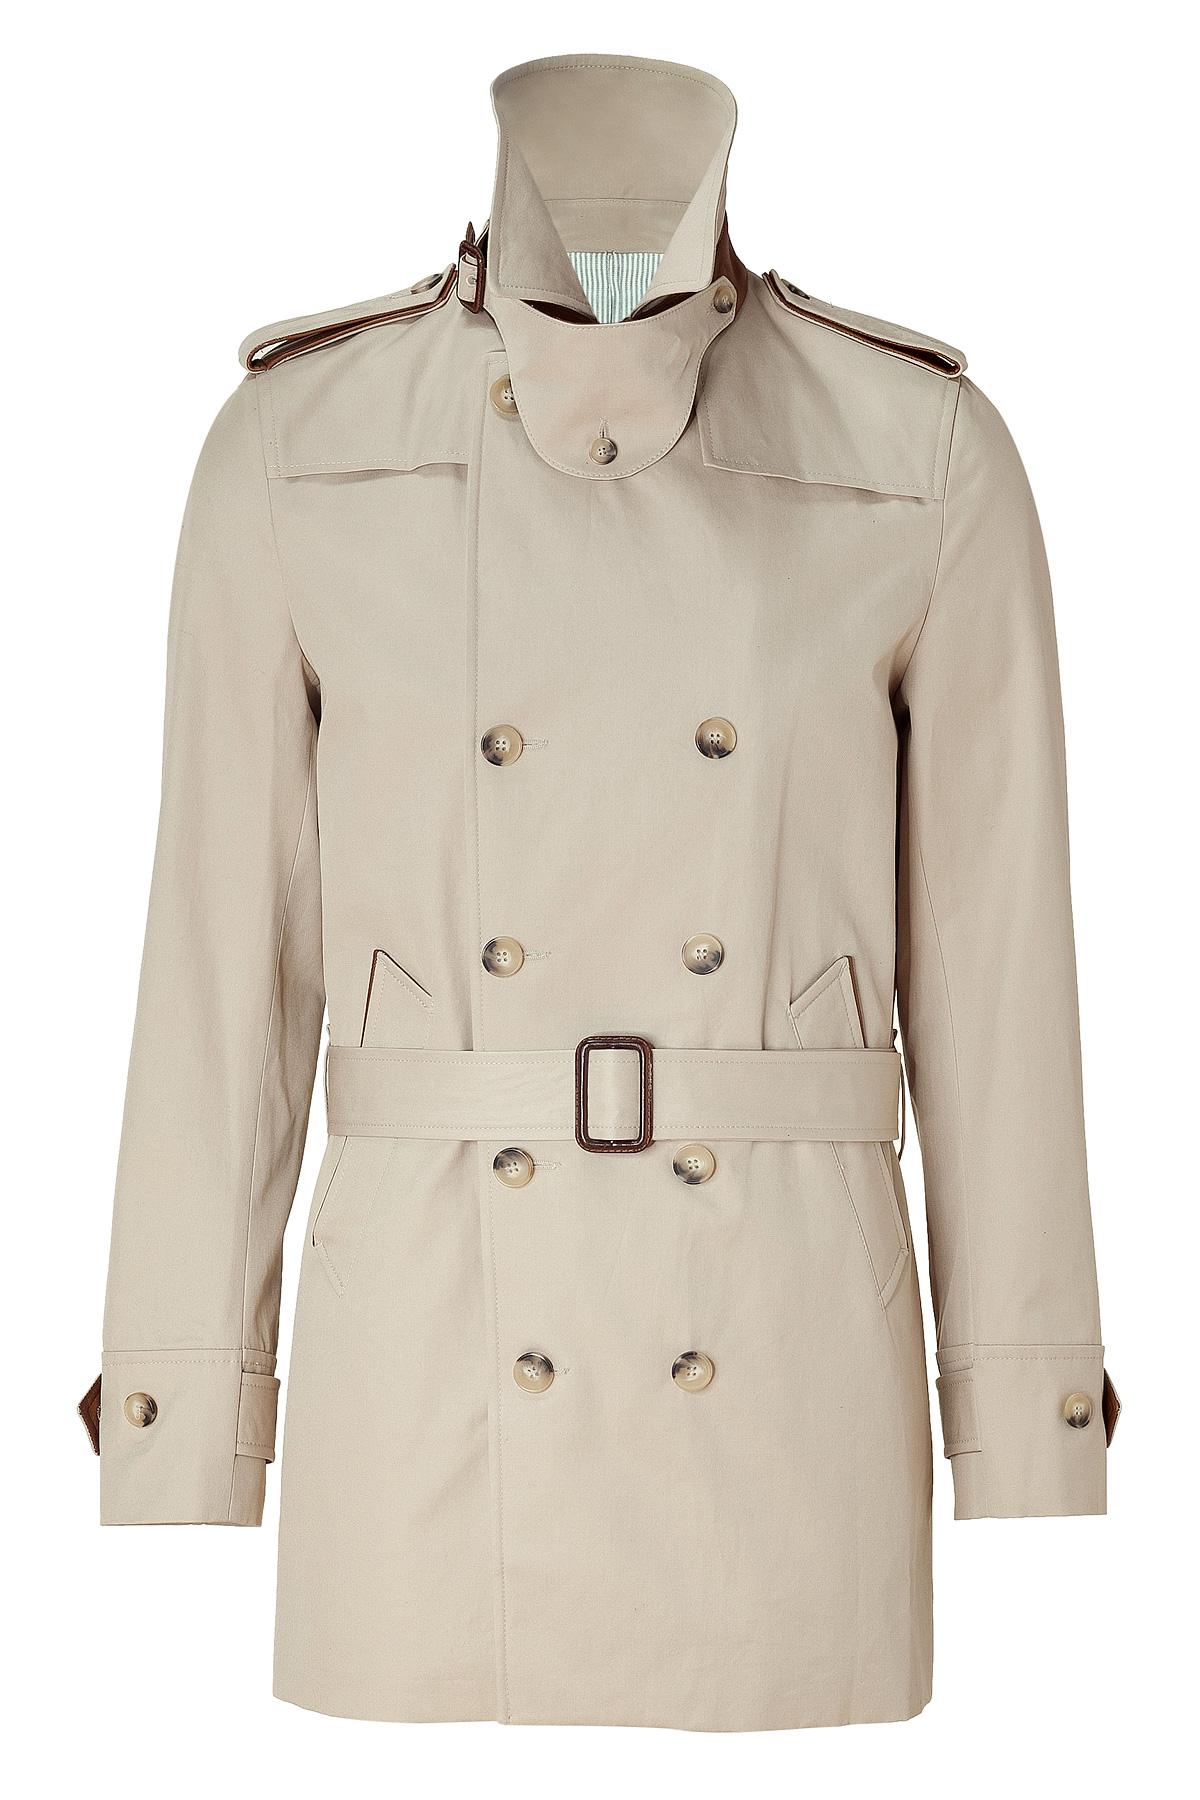 Sandro Sandstone Short Trench Coat in Natural for Men | Lyst